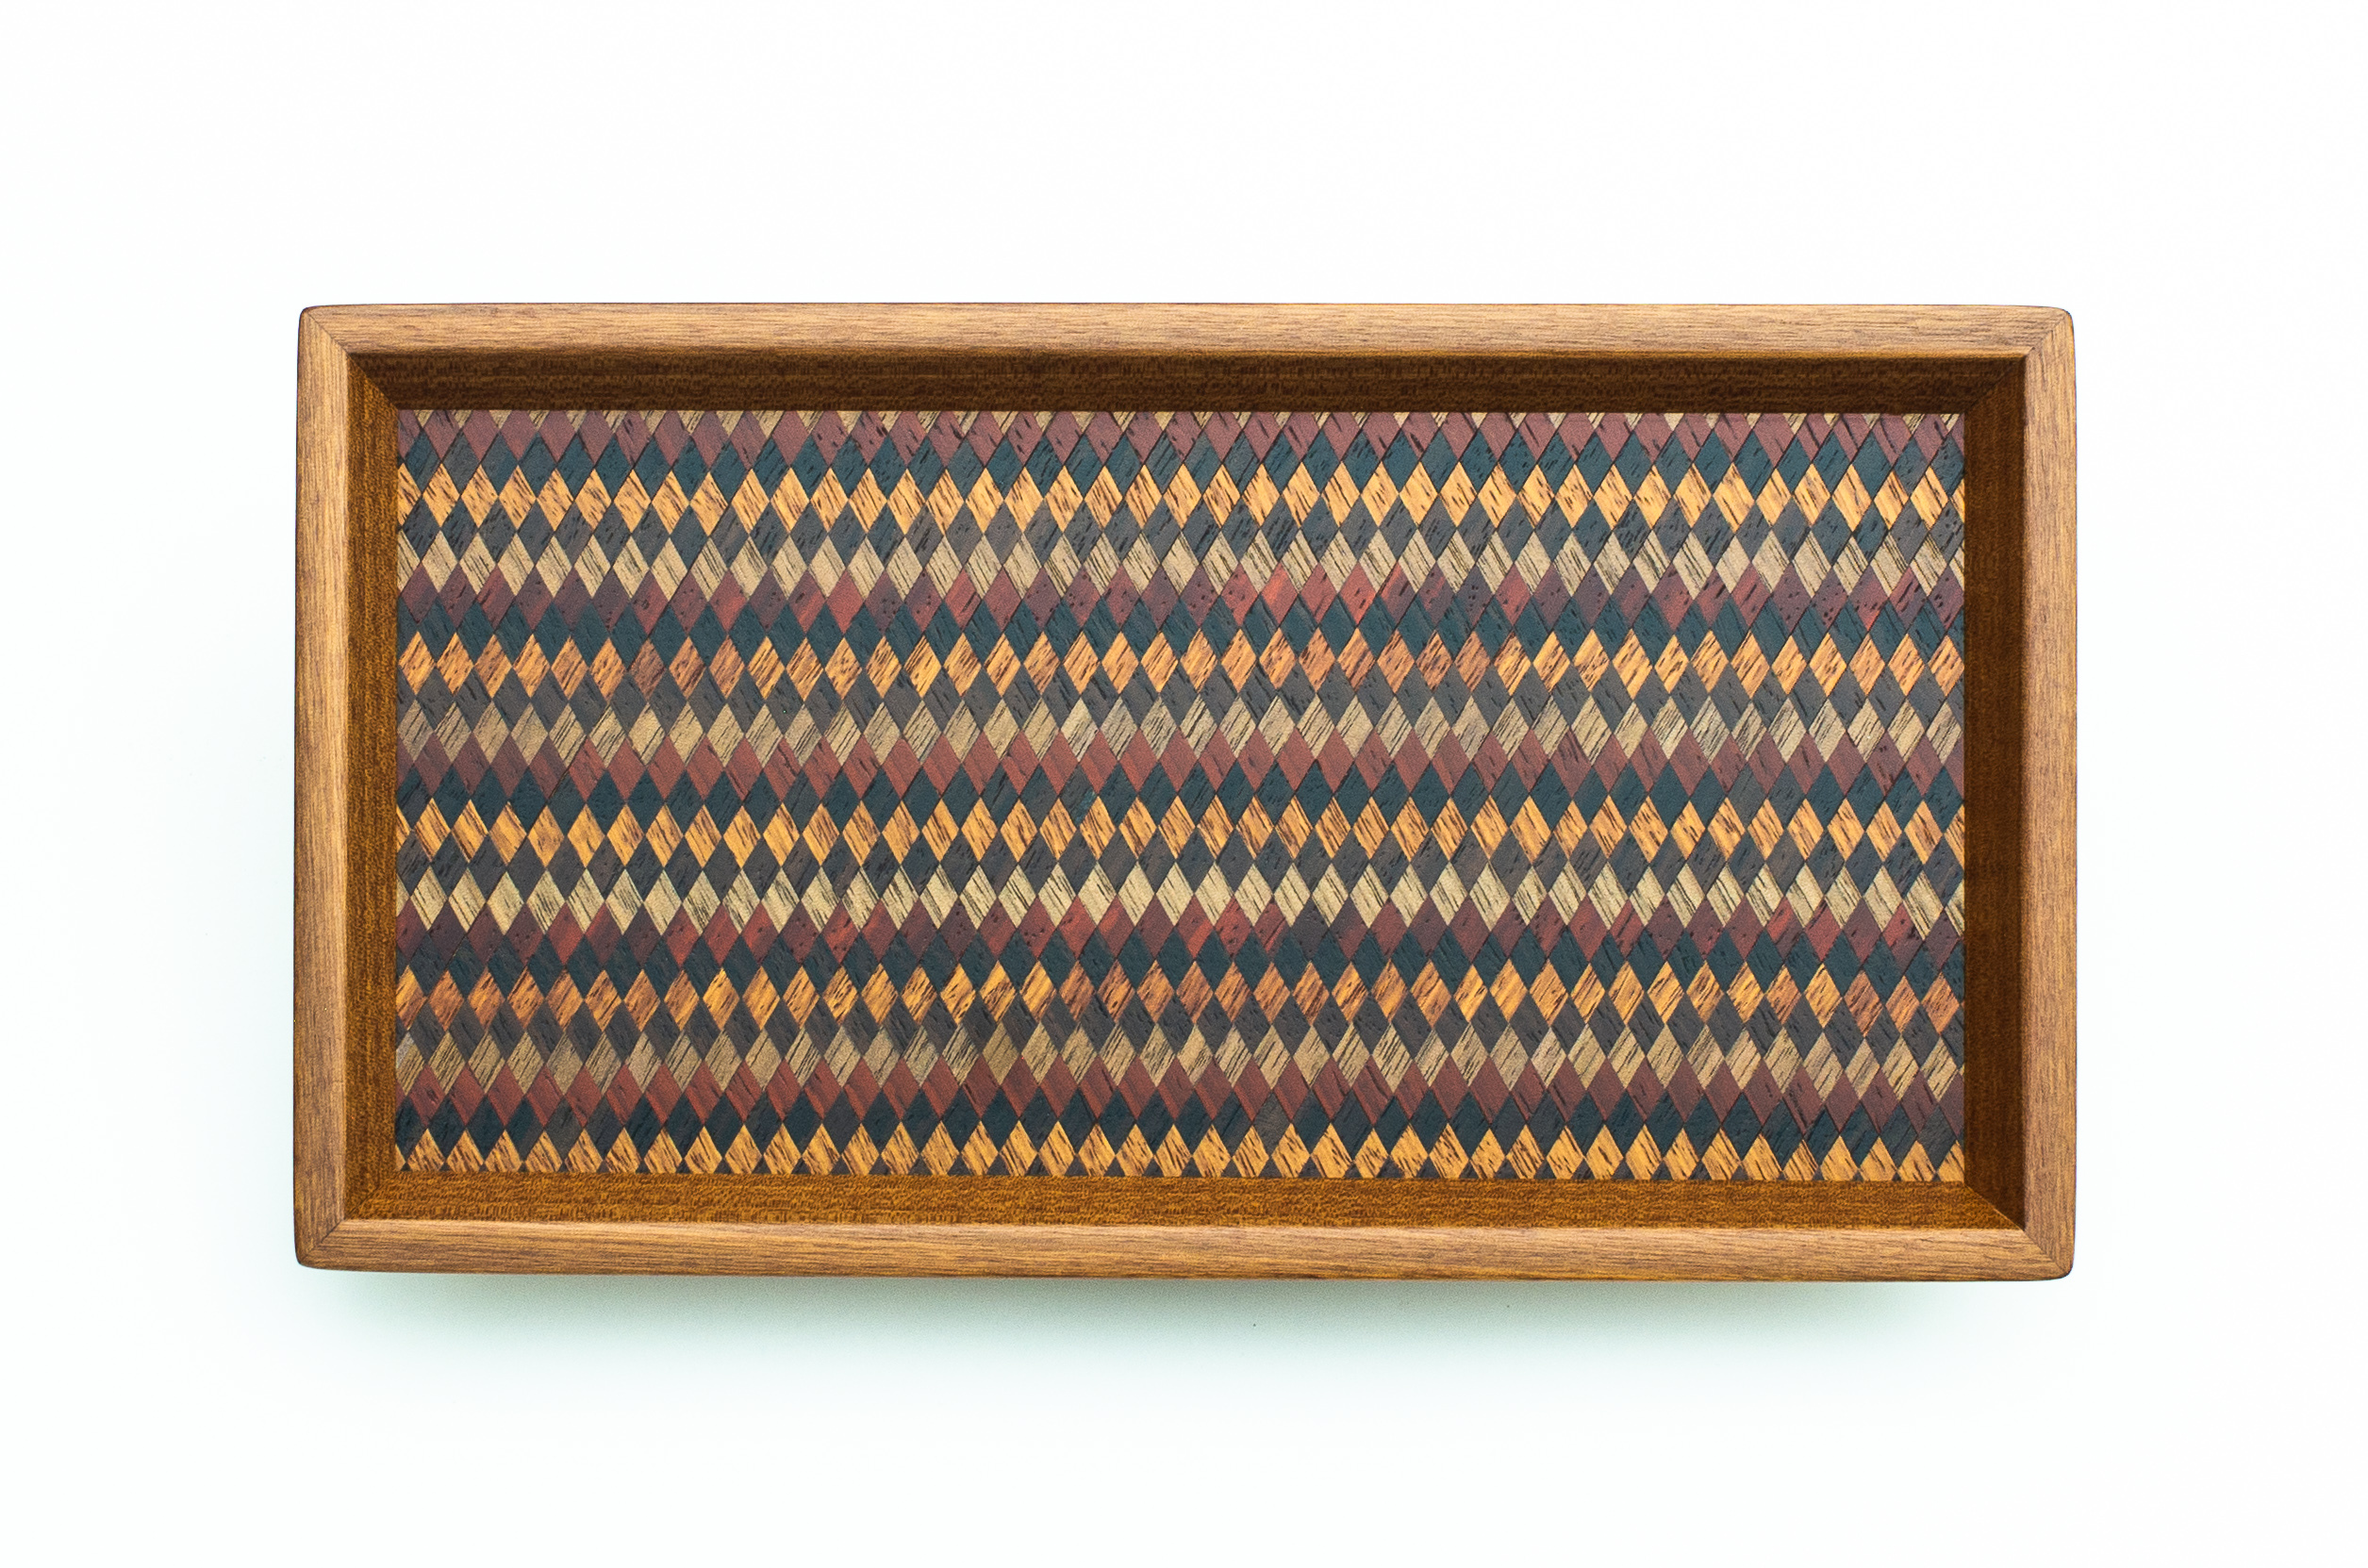 cutlery tray KBPD-0242